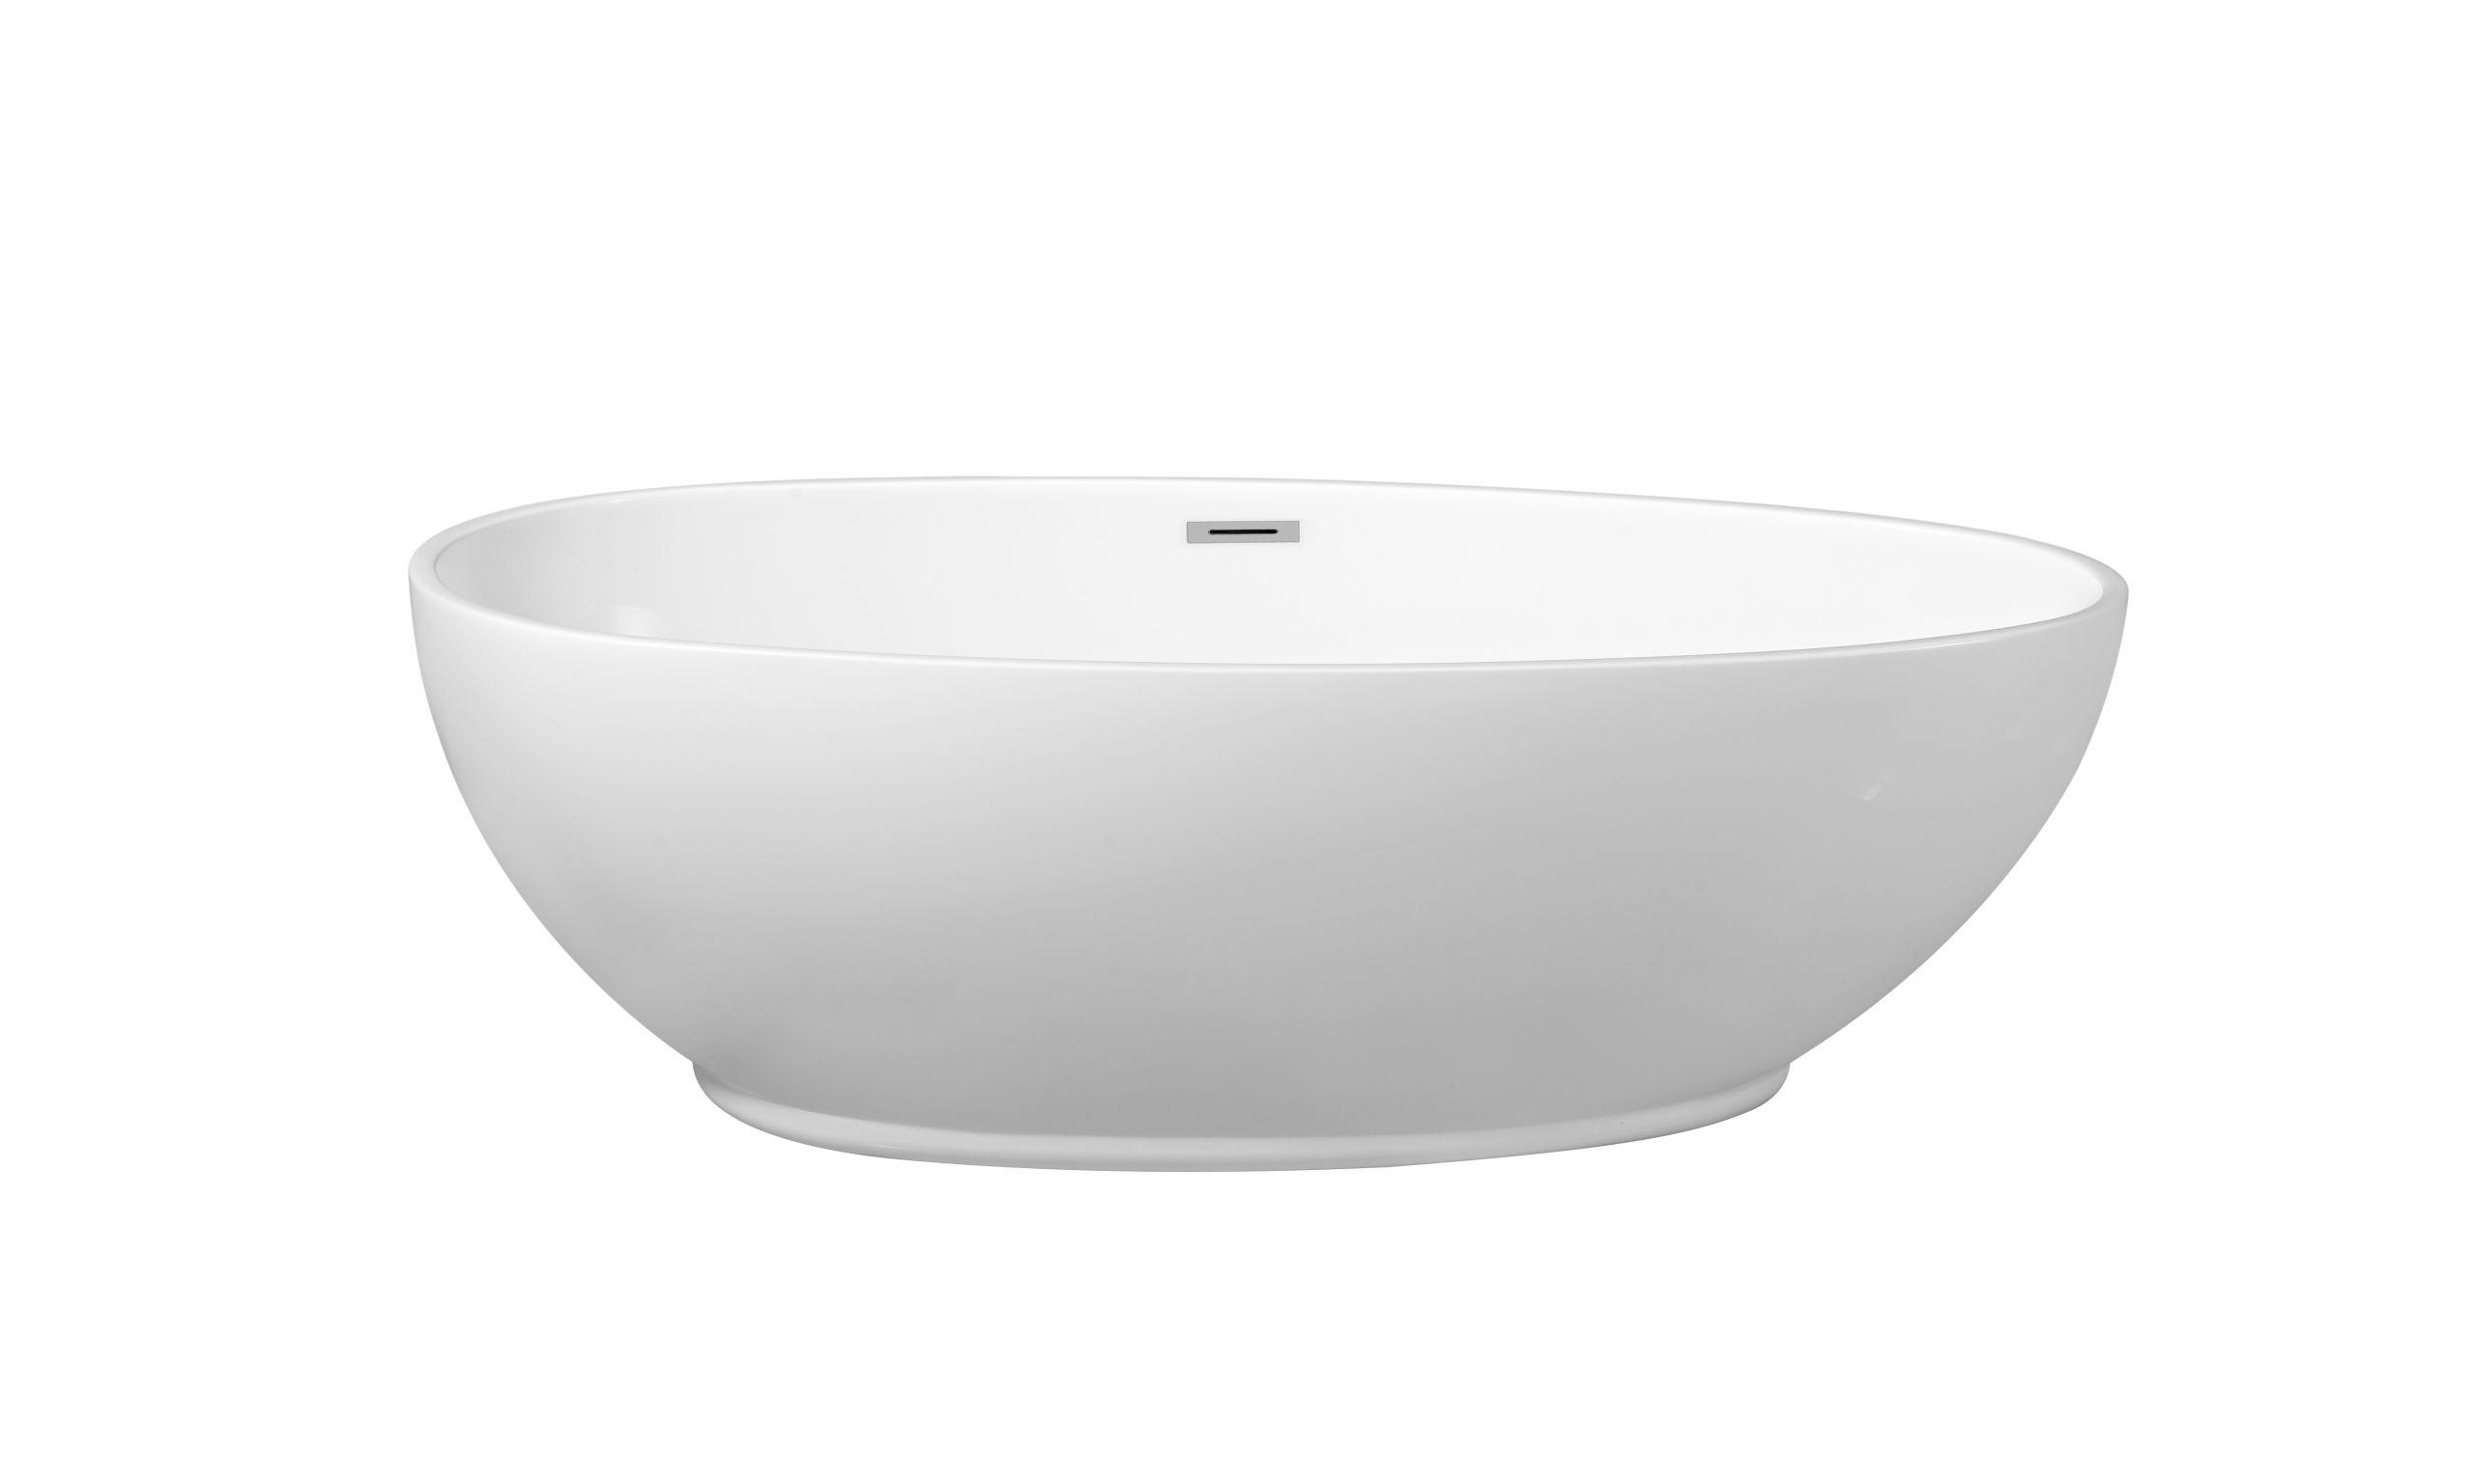 63 Inch Freestanding Bathtub Streamline N 380 63fswh Fm White 63 Inch soaking